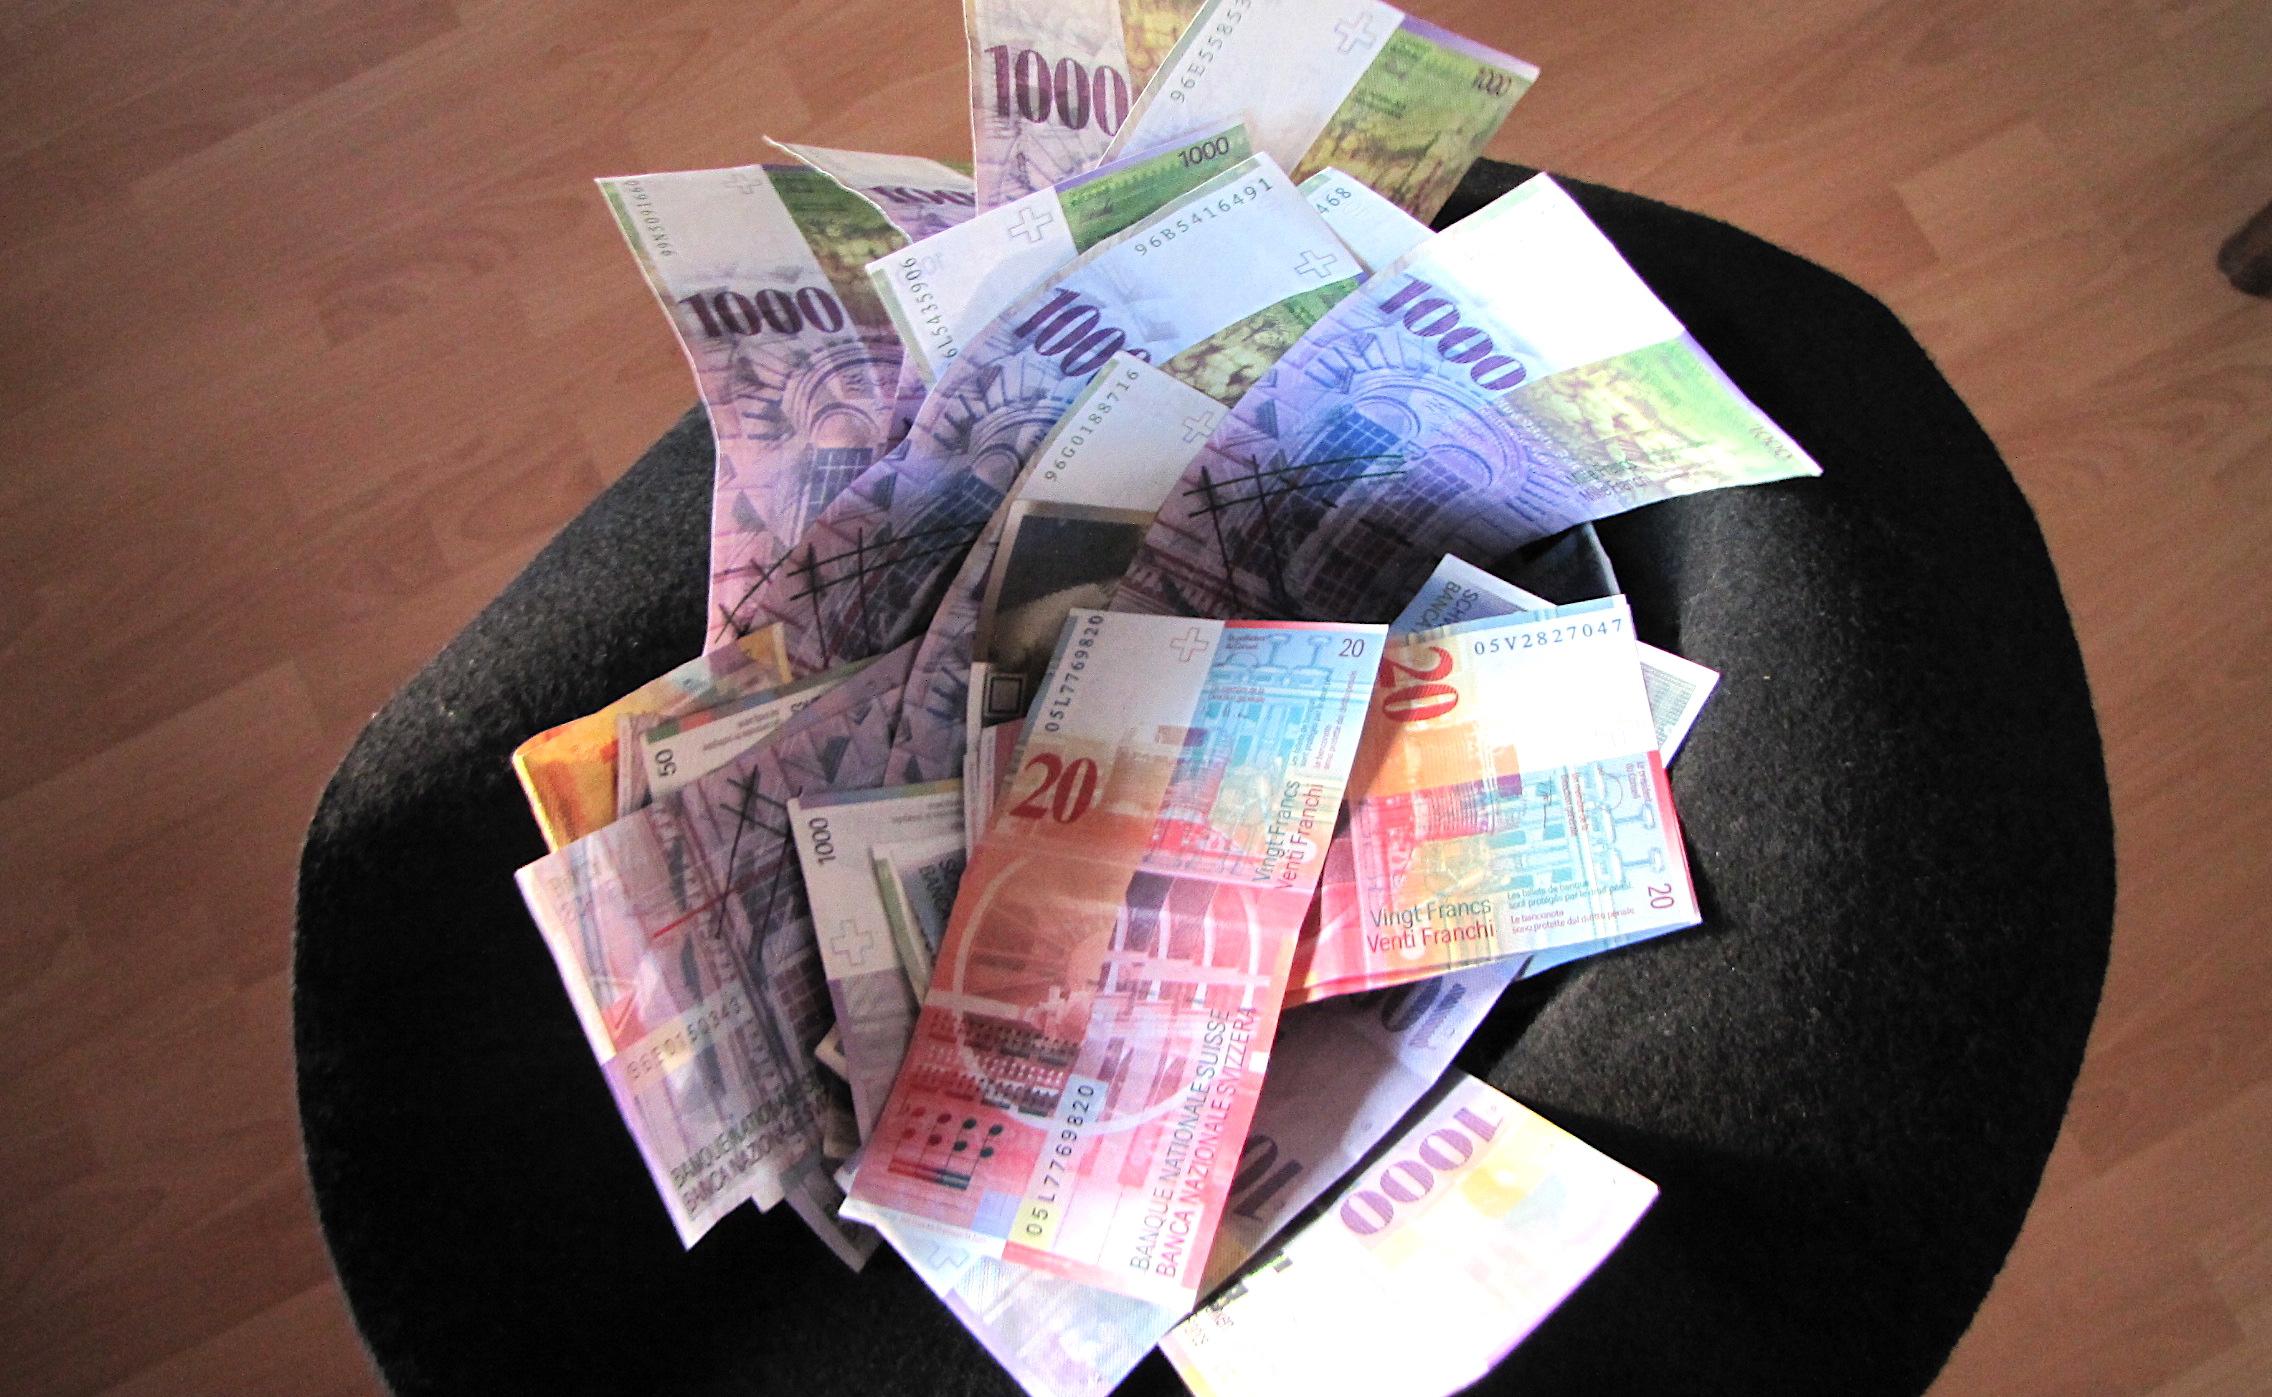 chapeau plein de billets de 1000 CHF